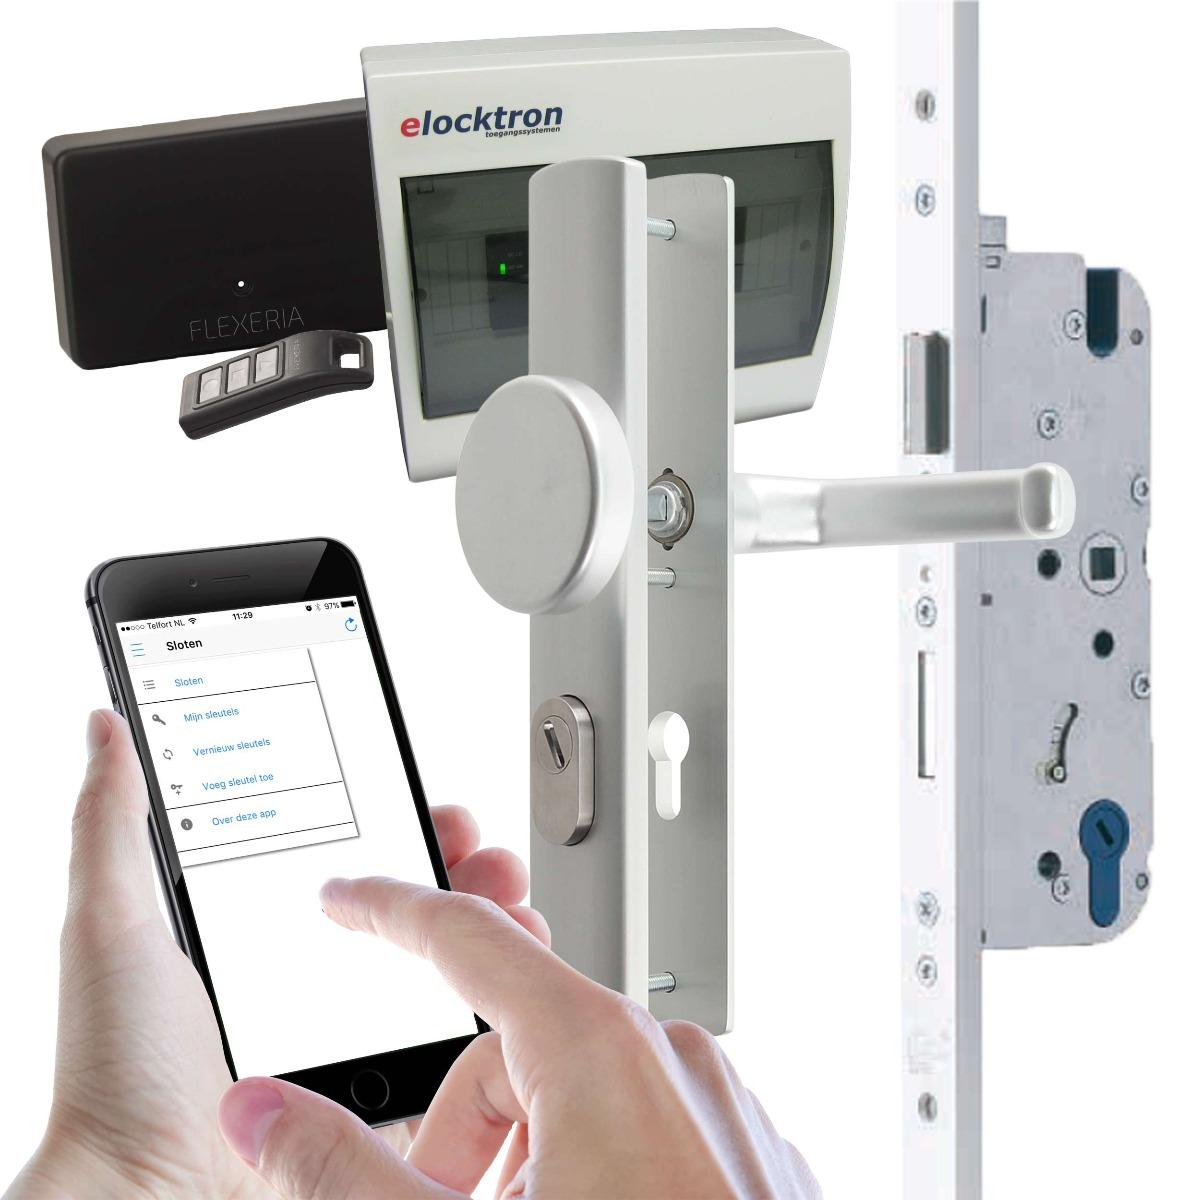 Compleet toegangssysteem met smartphone app